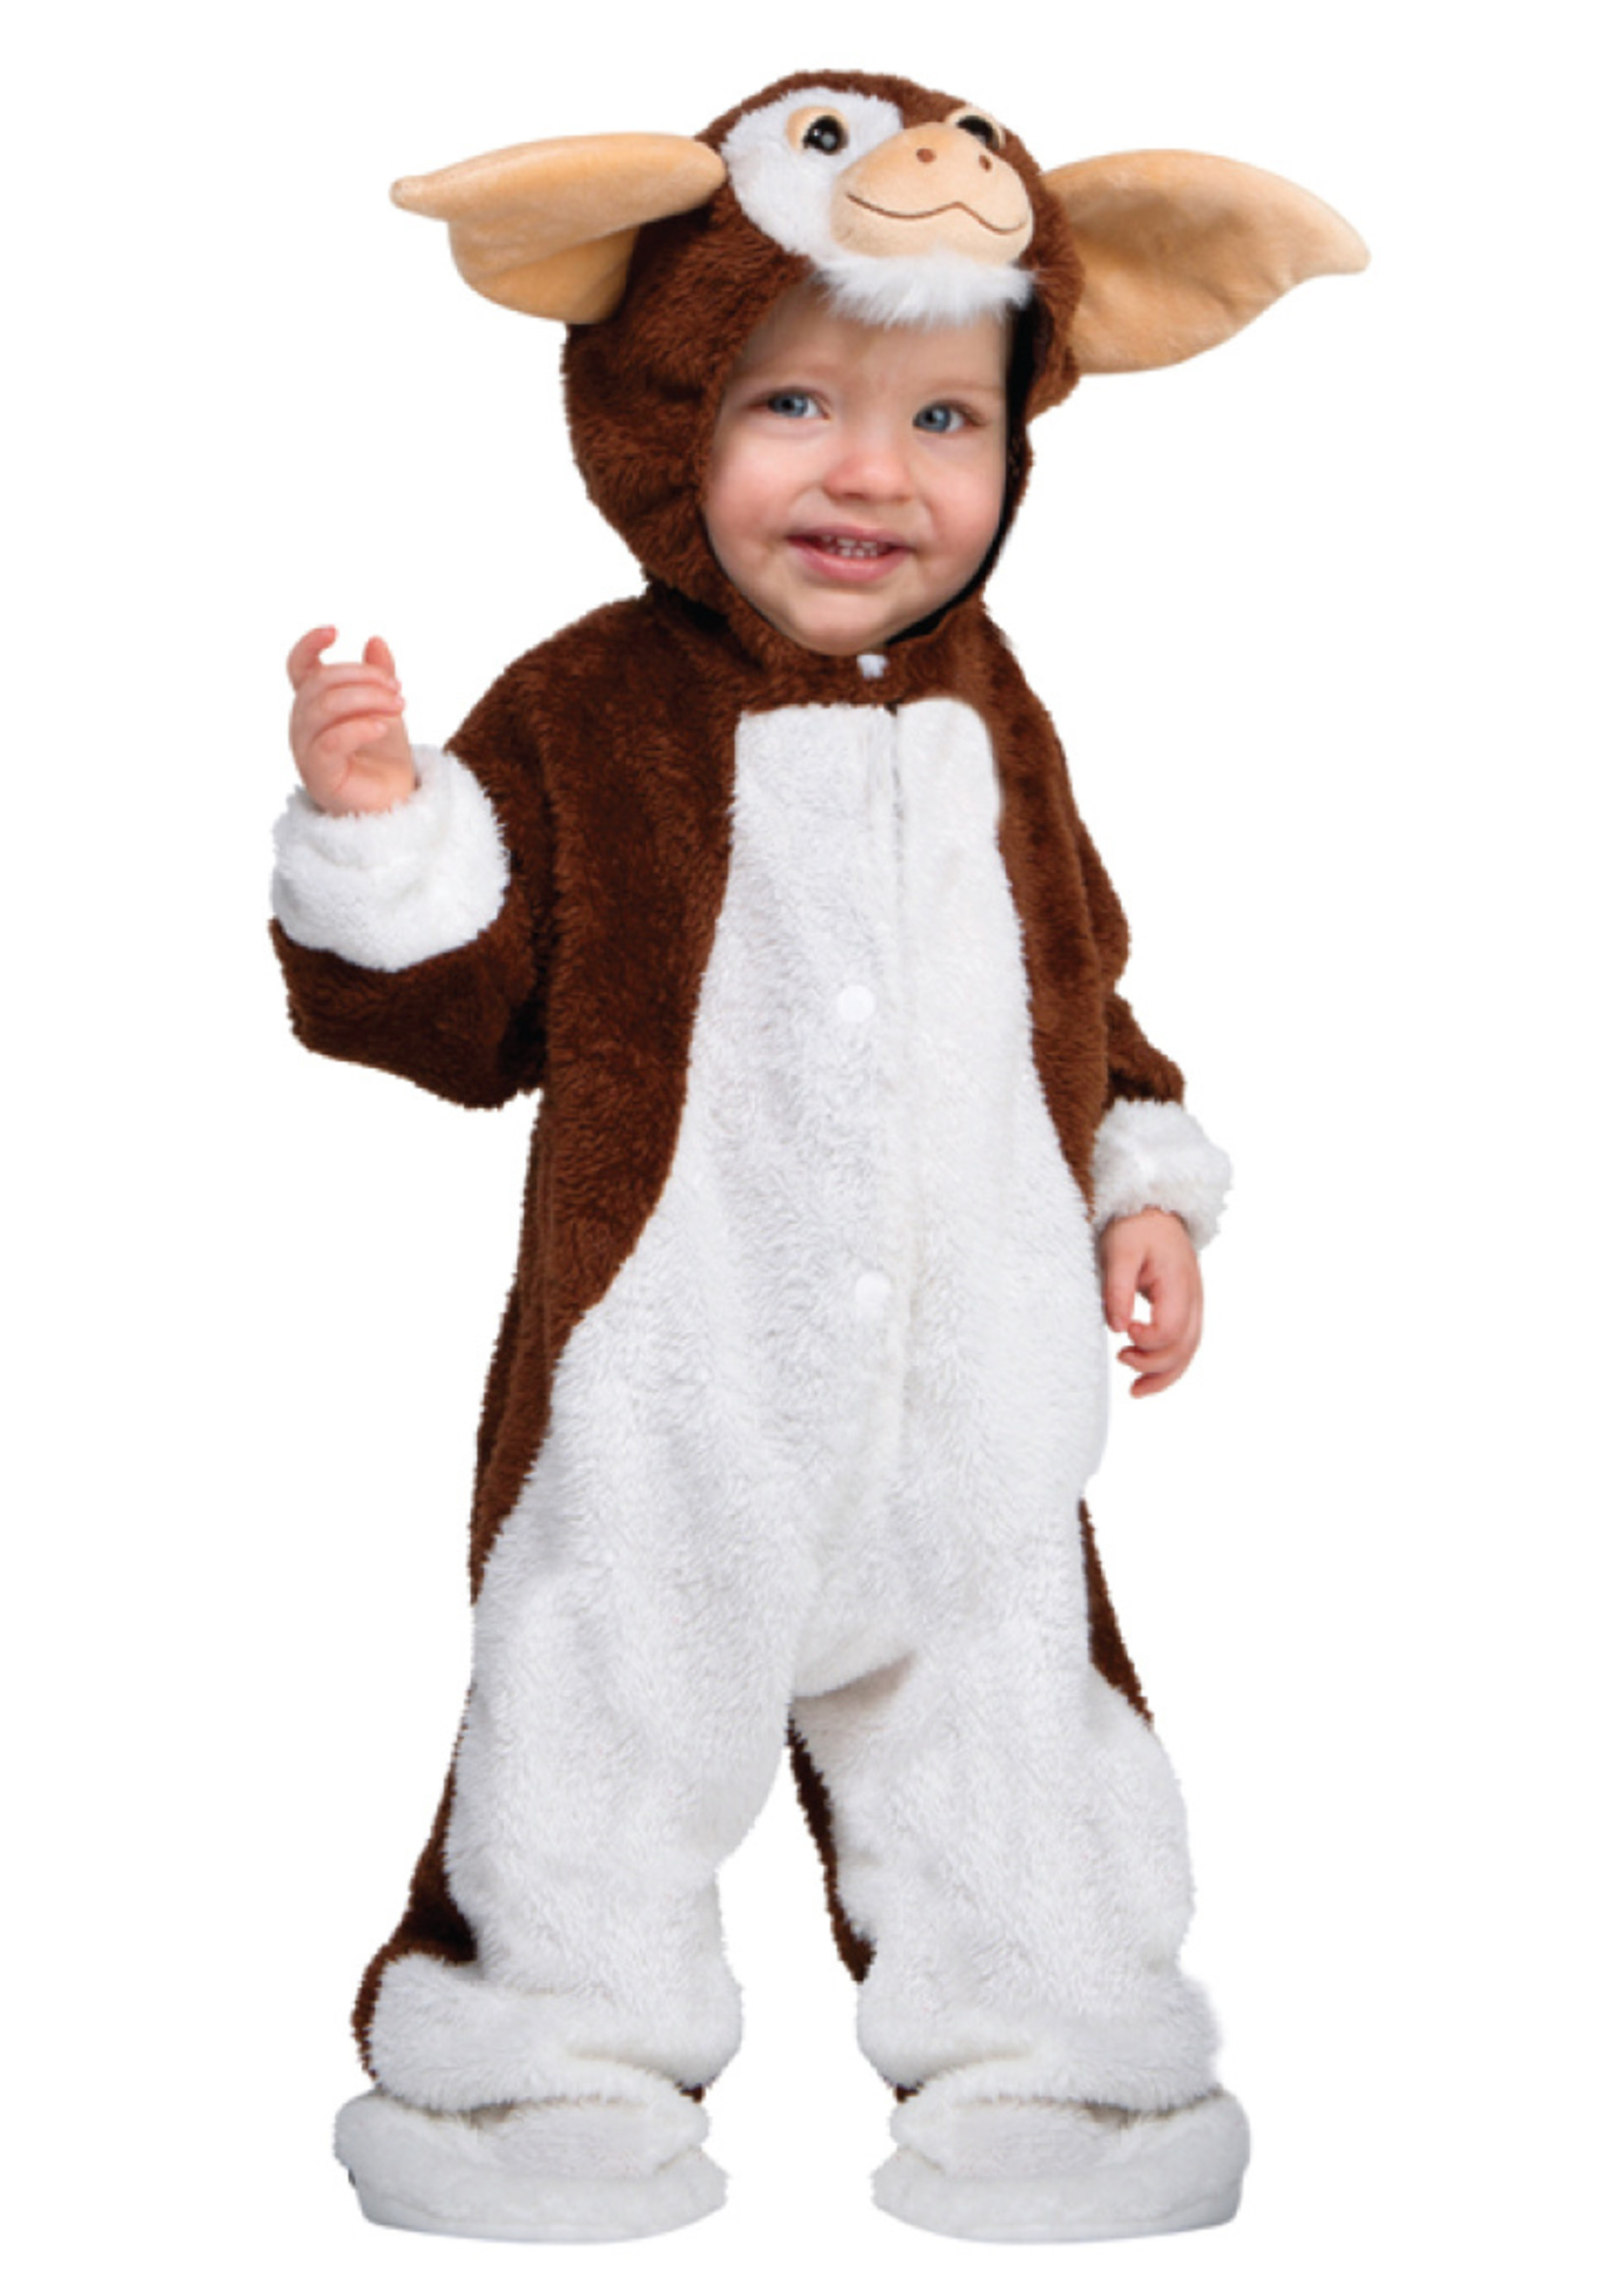 PALAMON Gremlins Gizmo Mischief Maker - Toddler